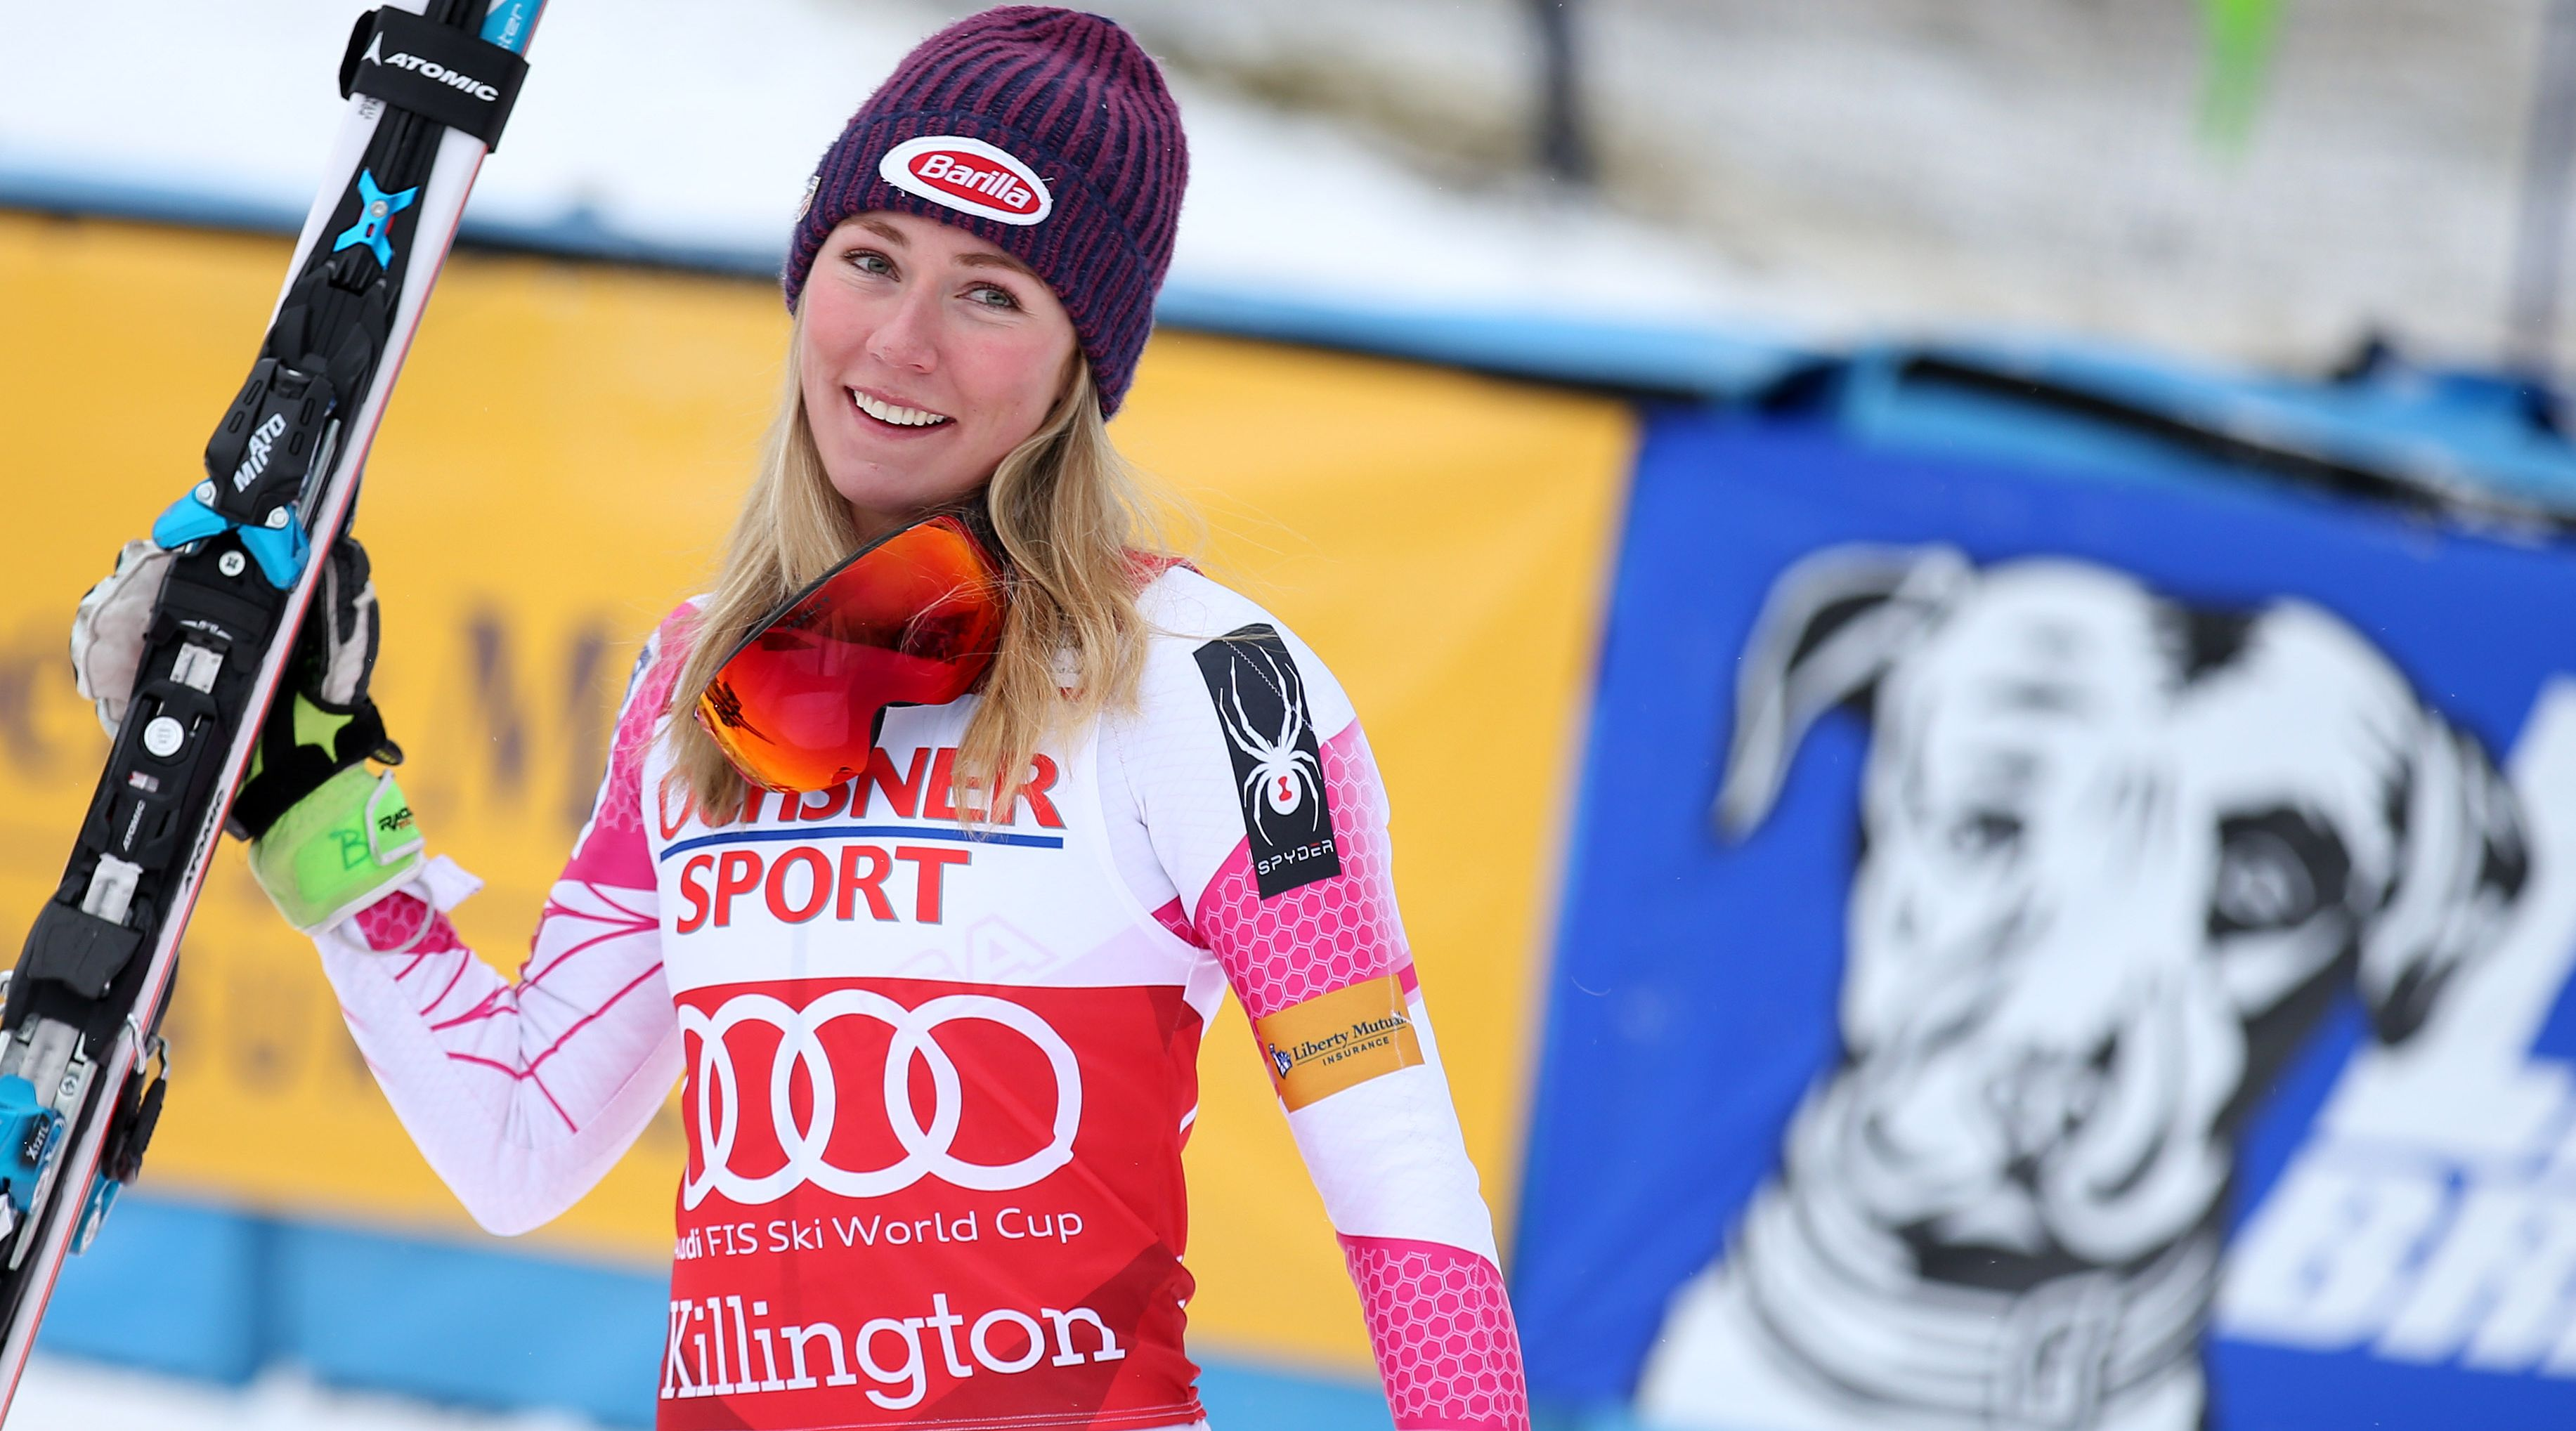 Sports d'hiver - Slalom : Shiffrin reçue 10 sur 10